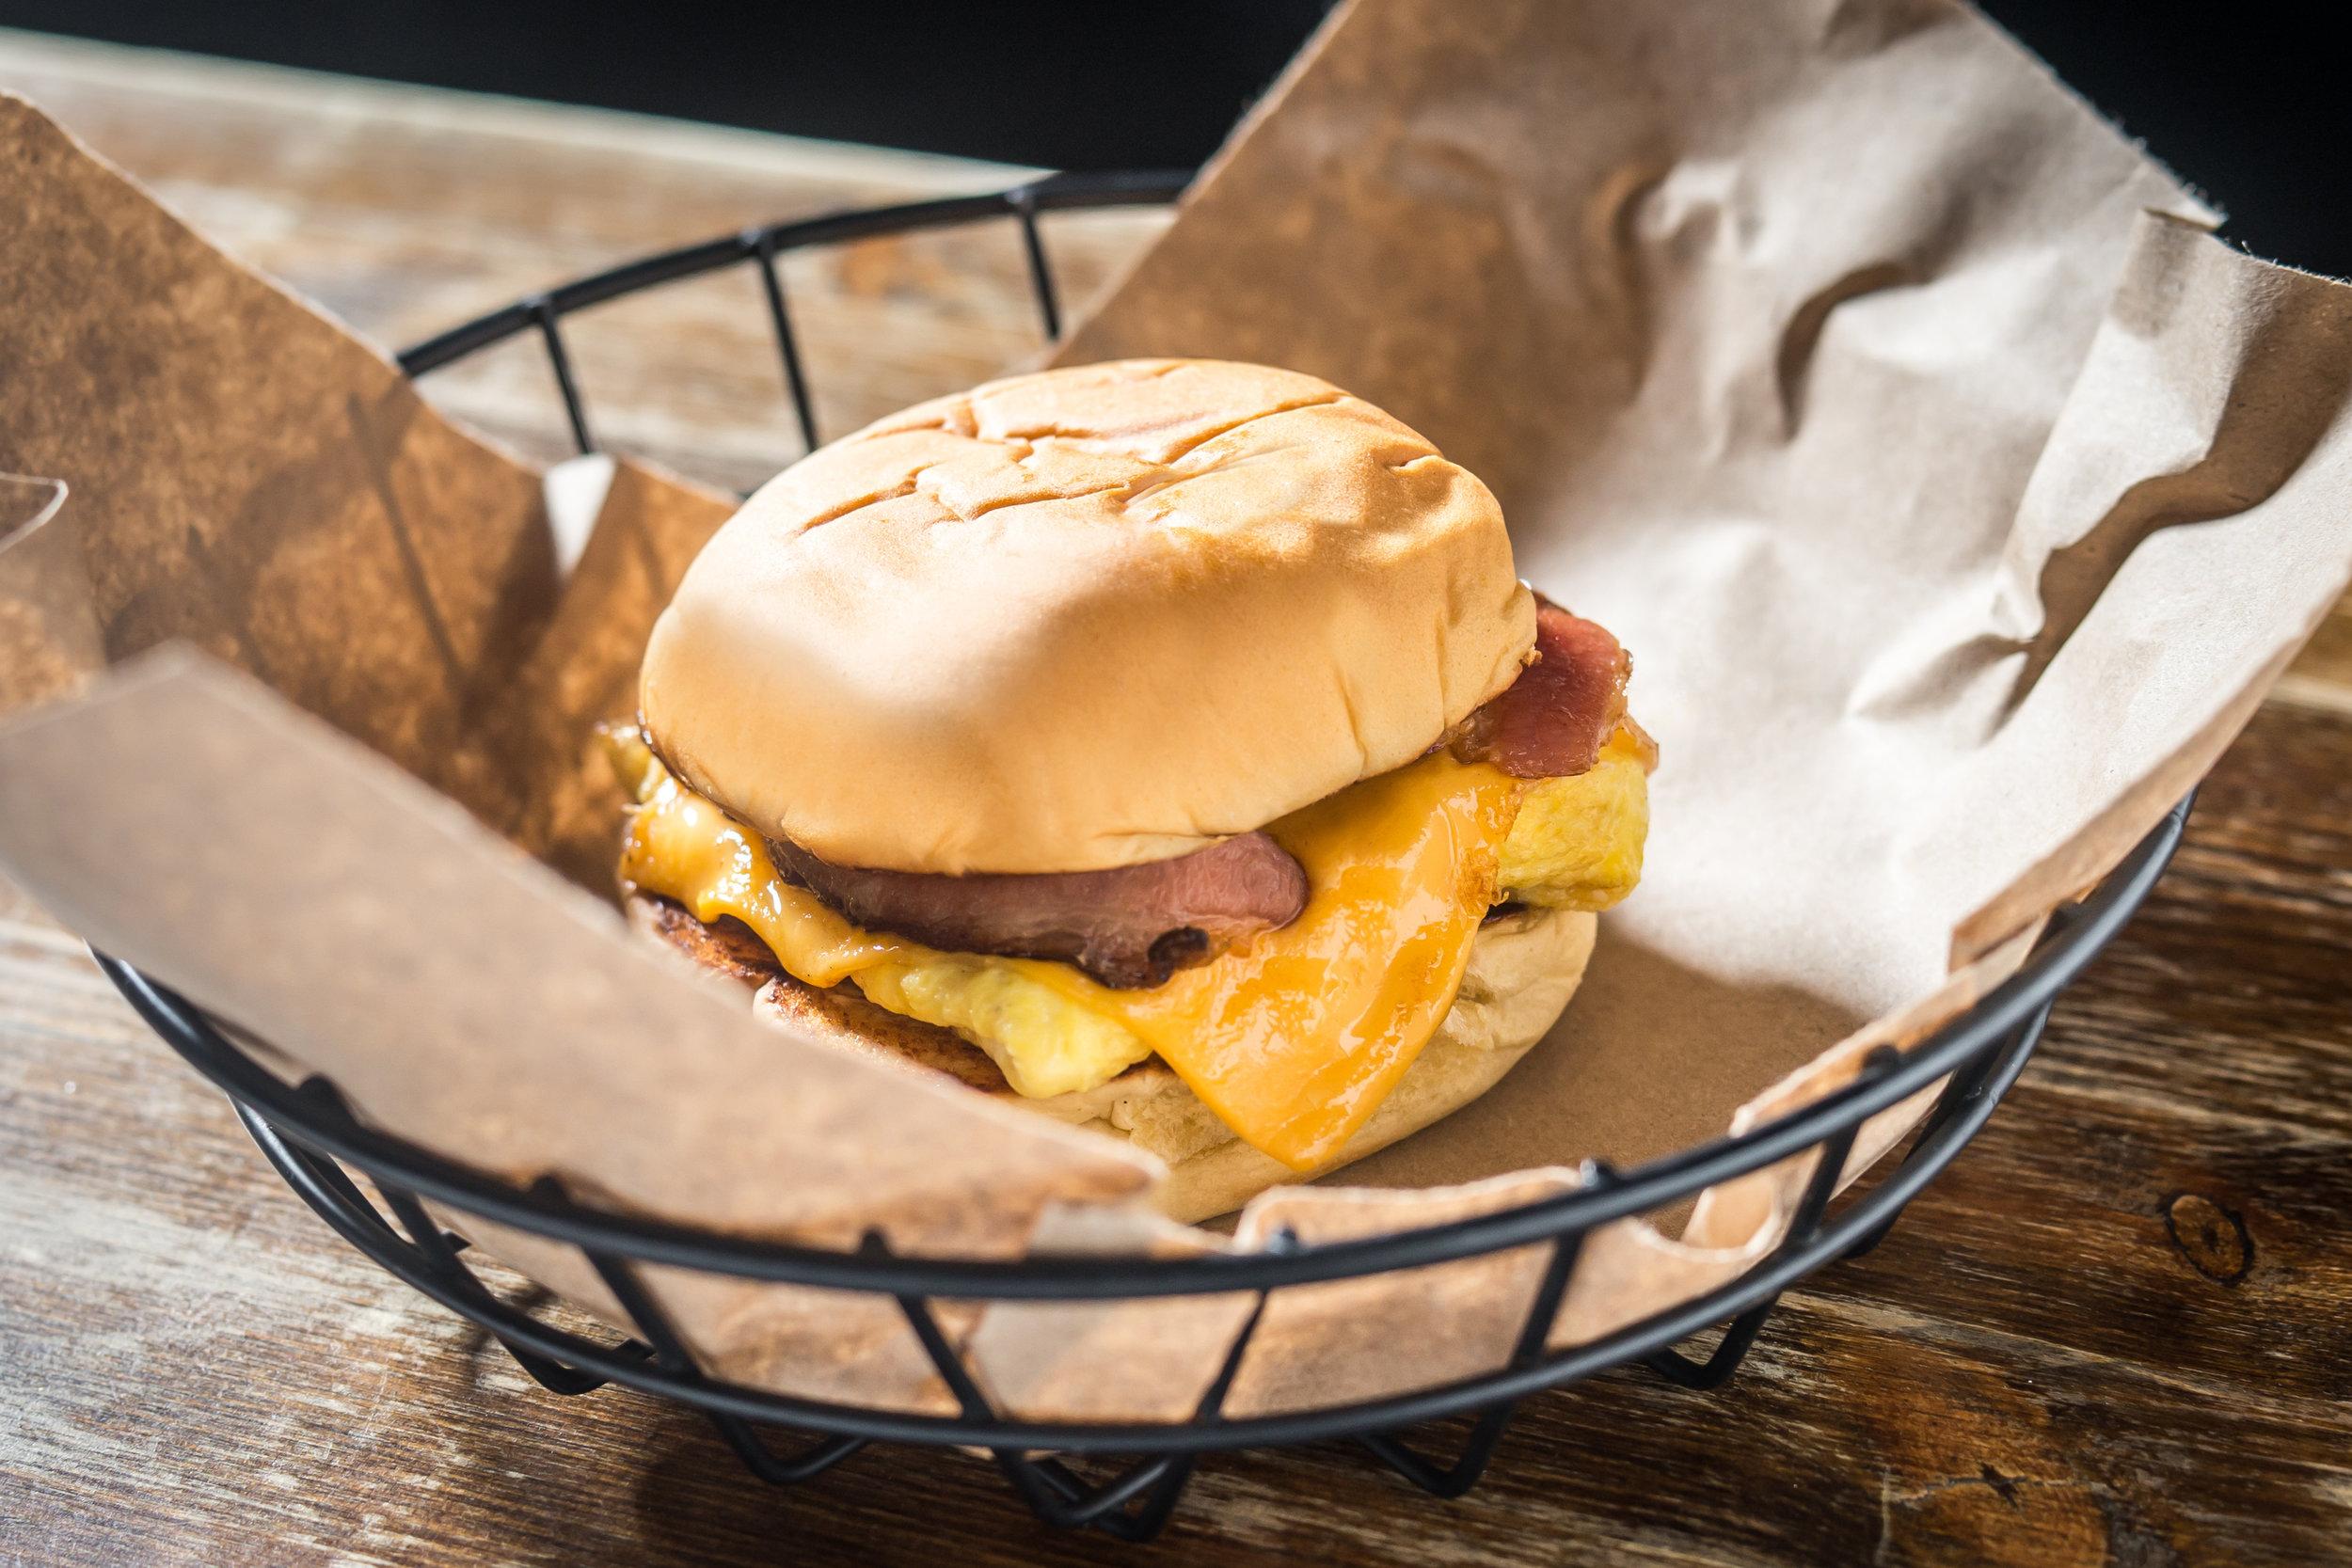 Egg Sandwich, served starting Midnight. Photo credit Paul Wagtouicz.